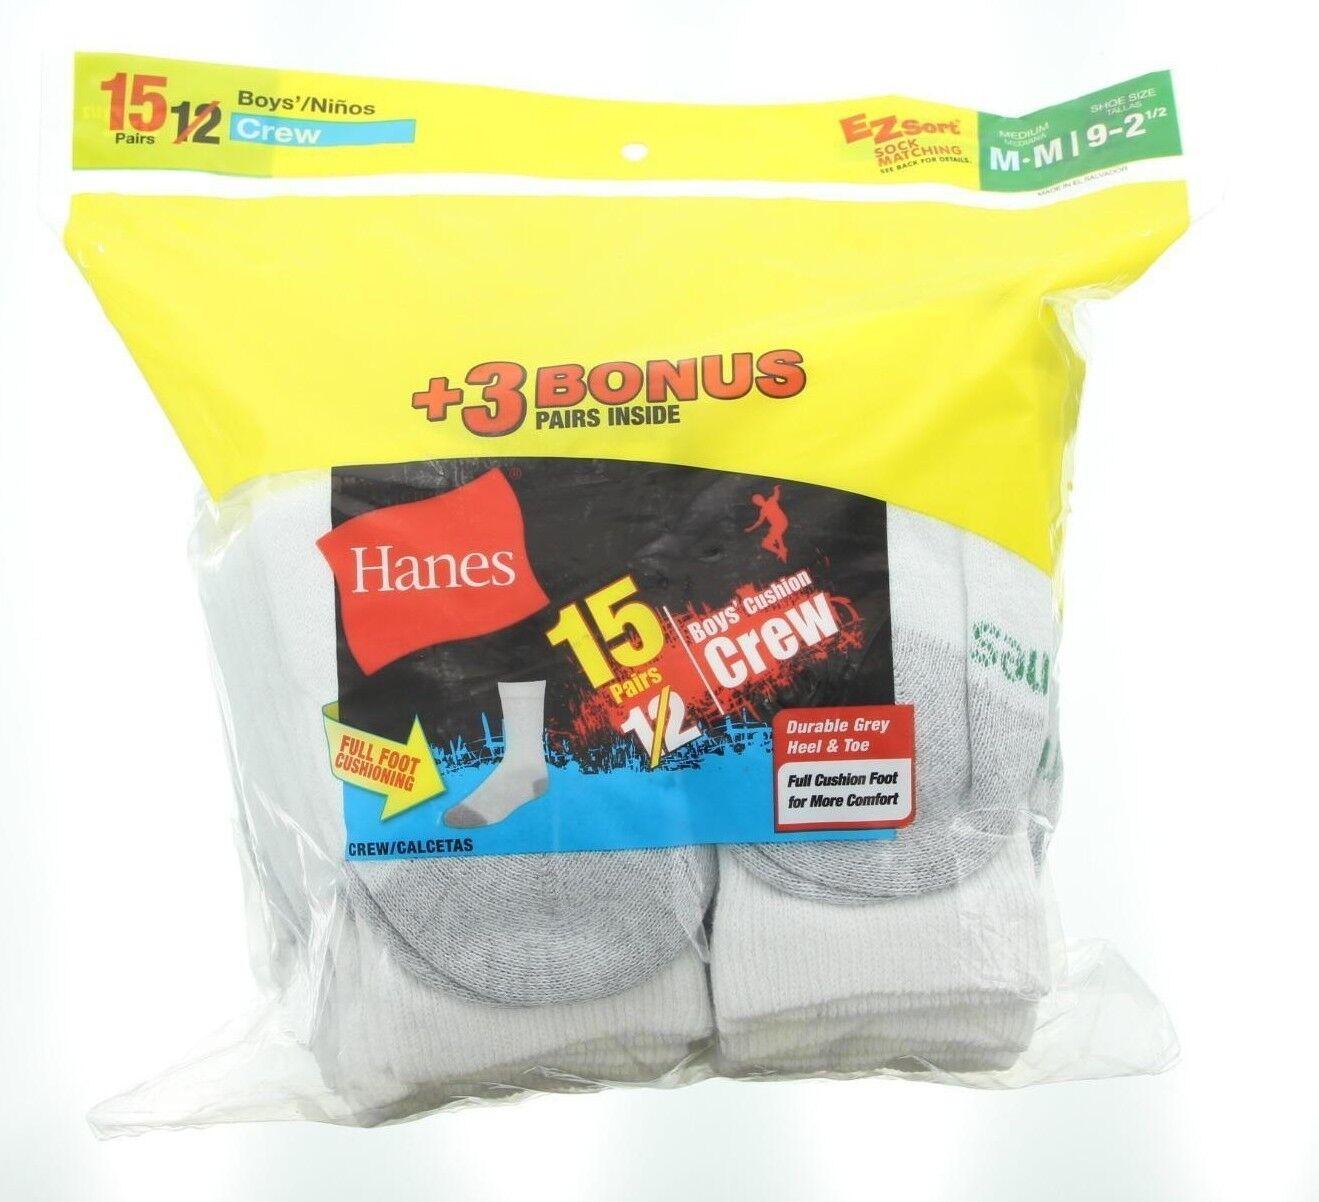 15 Pack Hanes Boys Full Cushion Foot Heel & Toe Comfort Crew